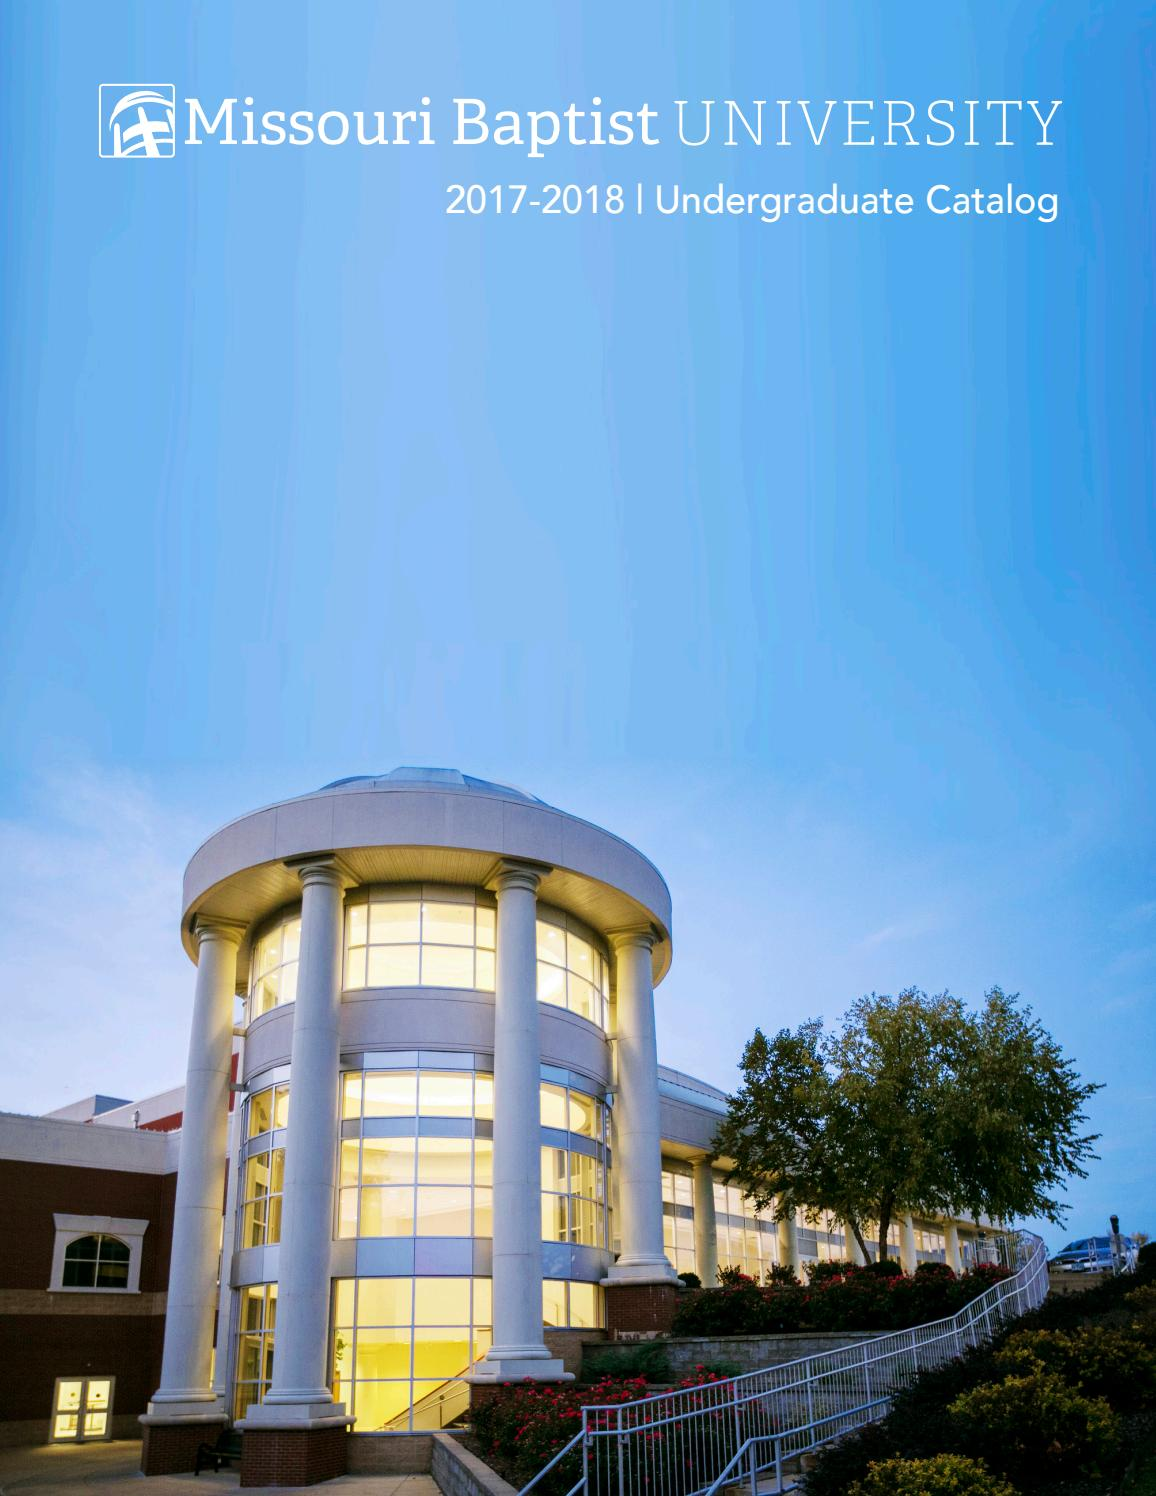 Undergraduate Catalog 2017-2018 by Missouri Baptist University - issuu